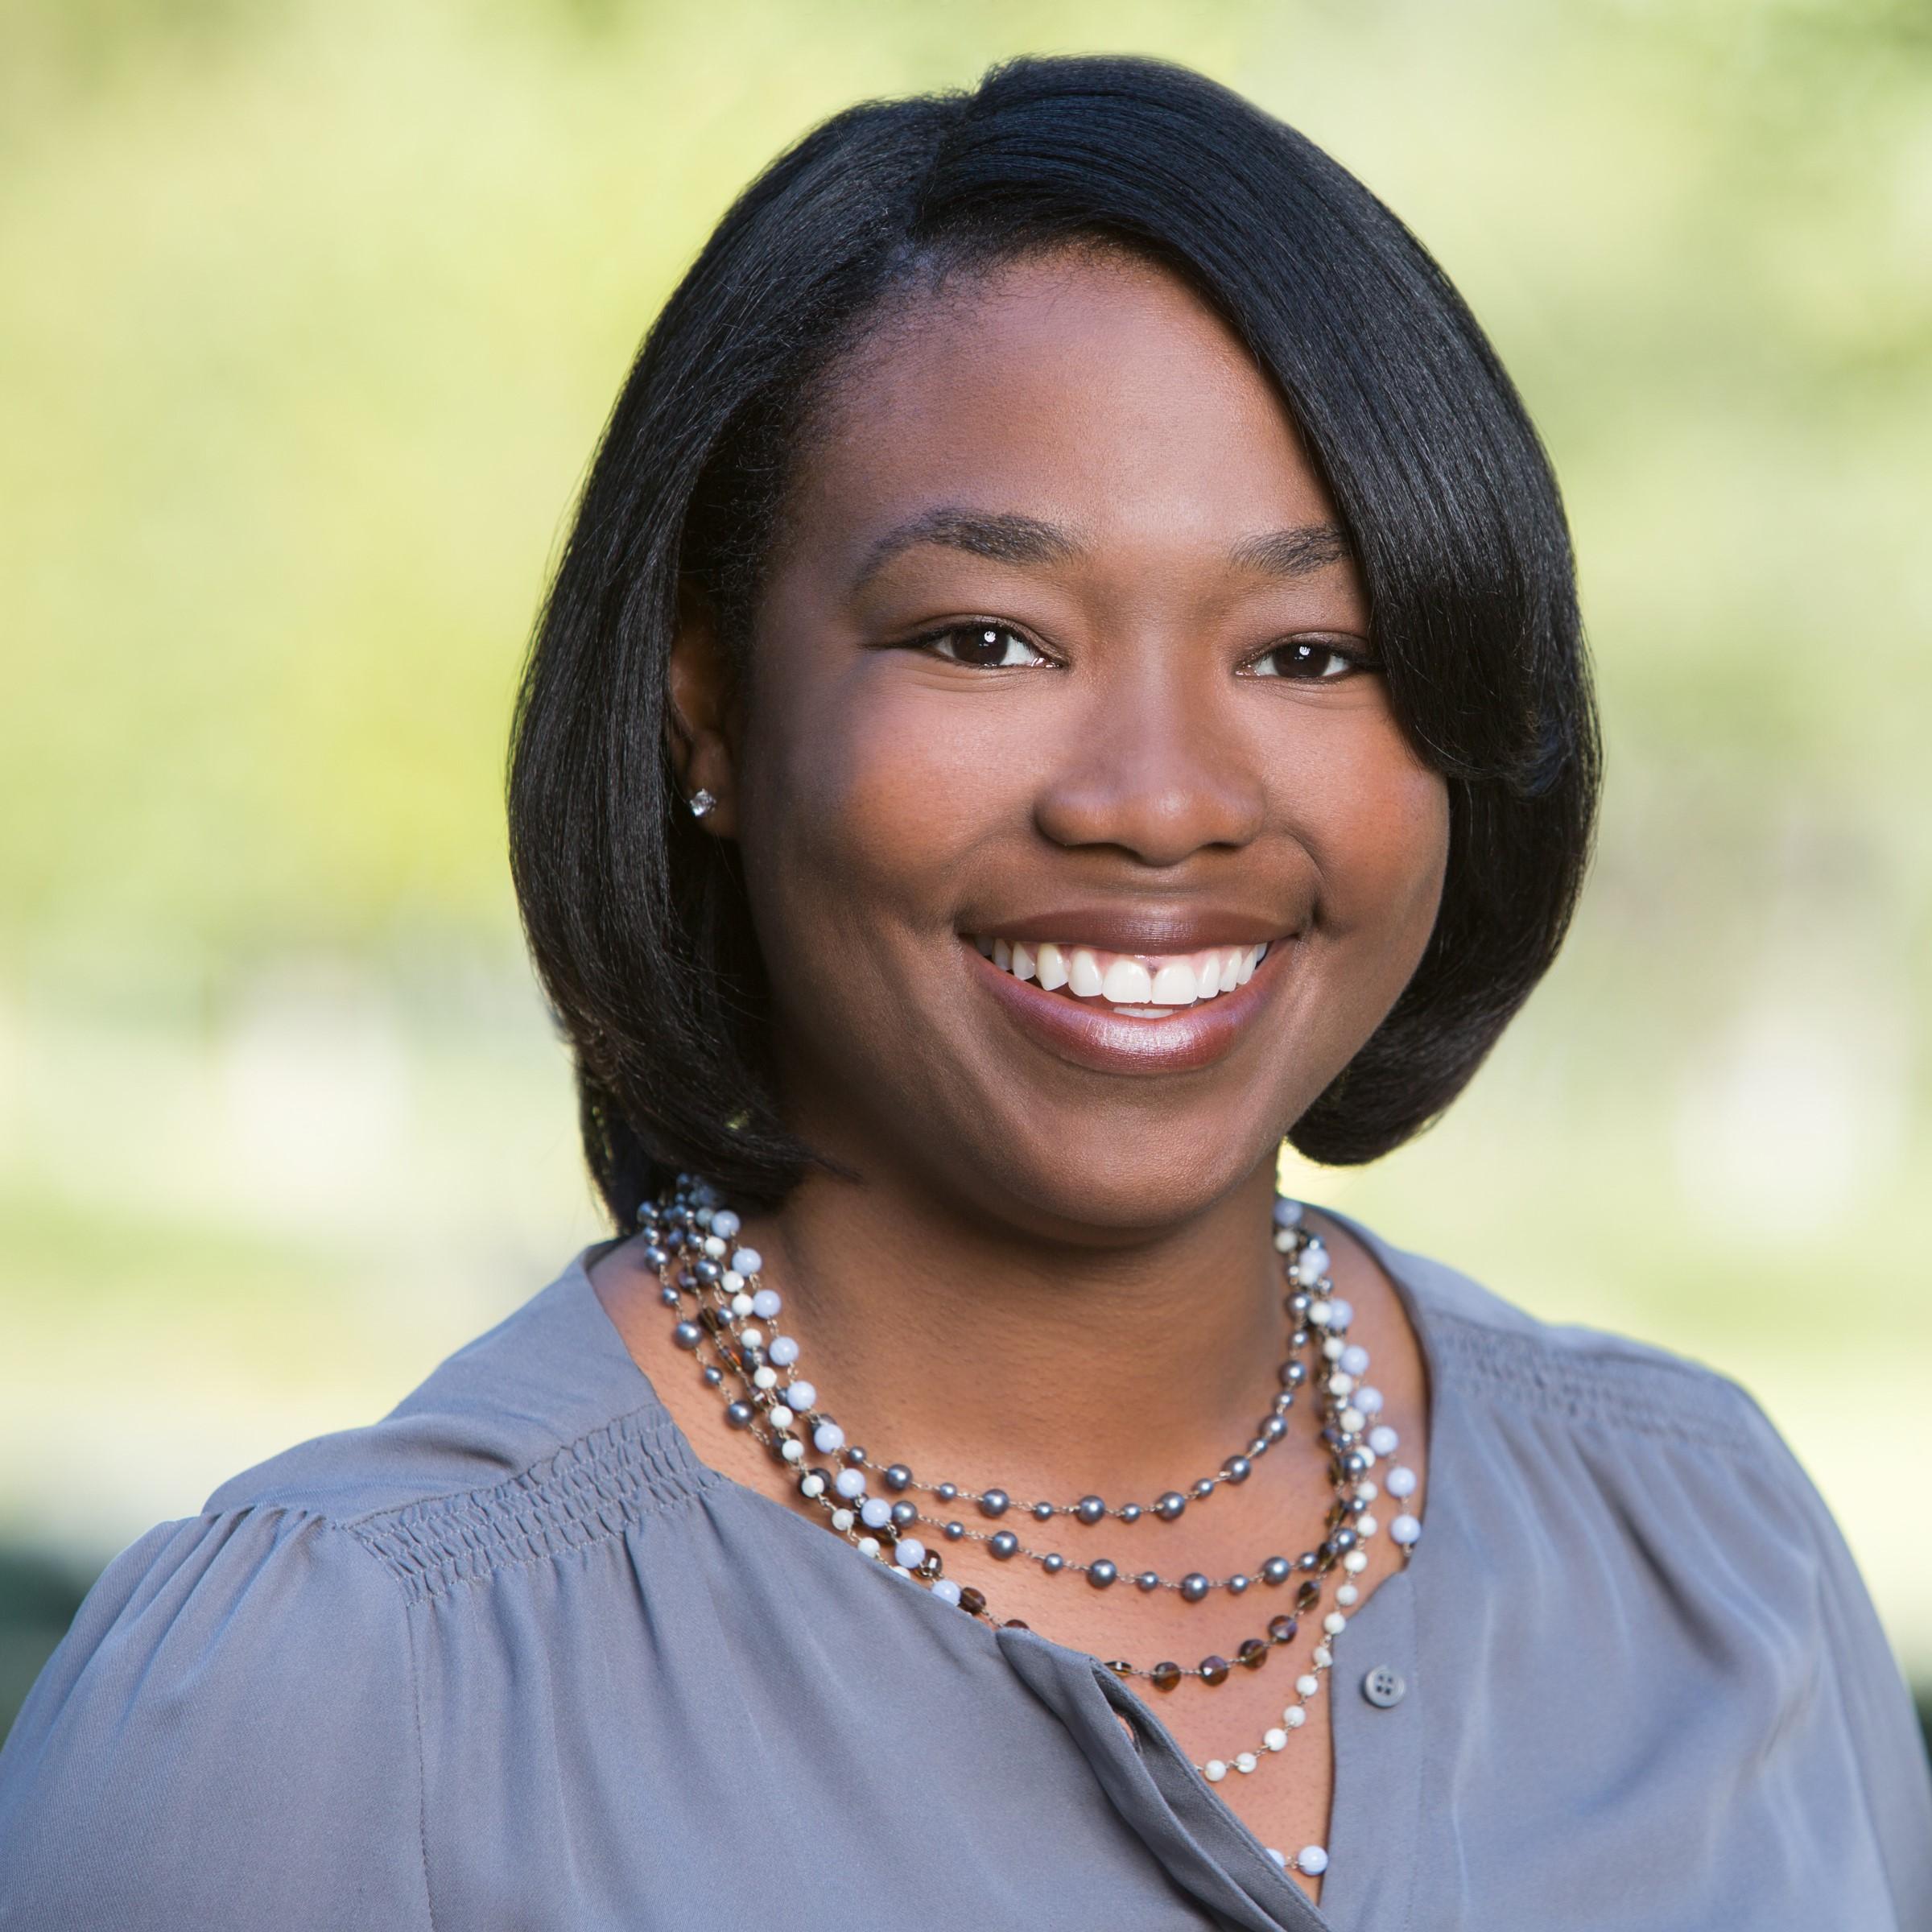 Jennifer Shipp, General Counsel, Heising-Simons Foundation